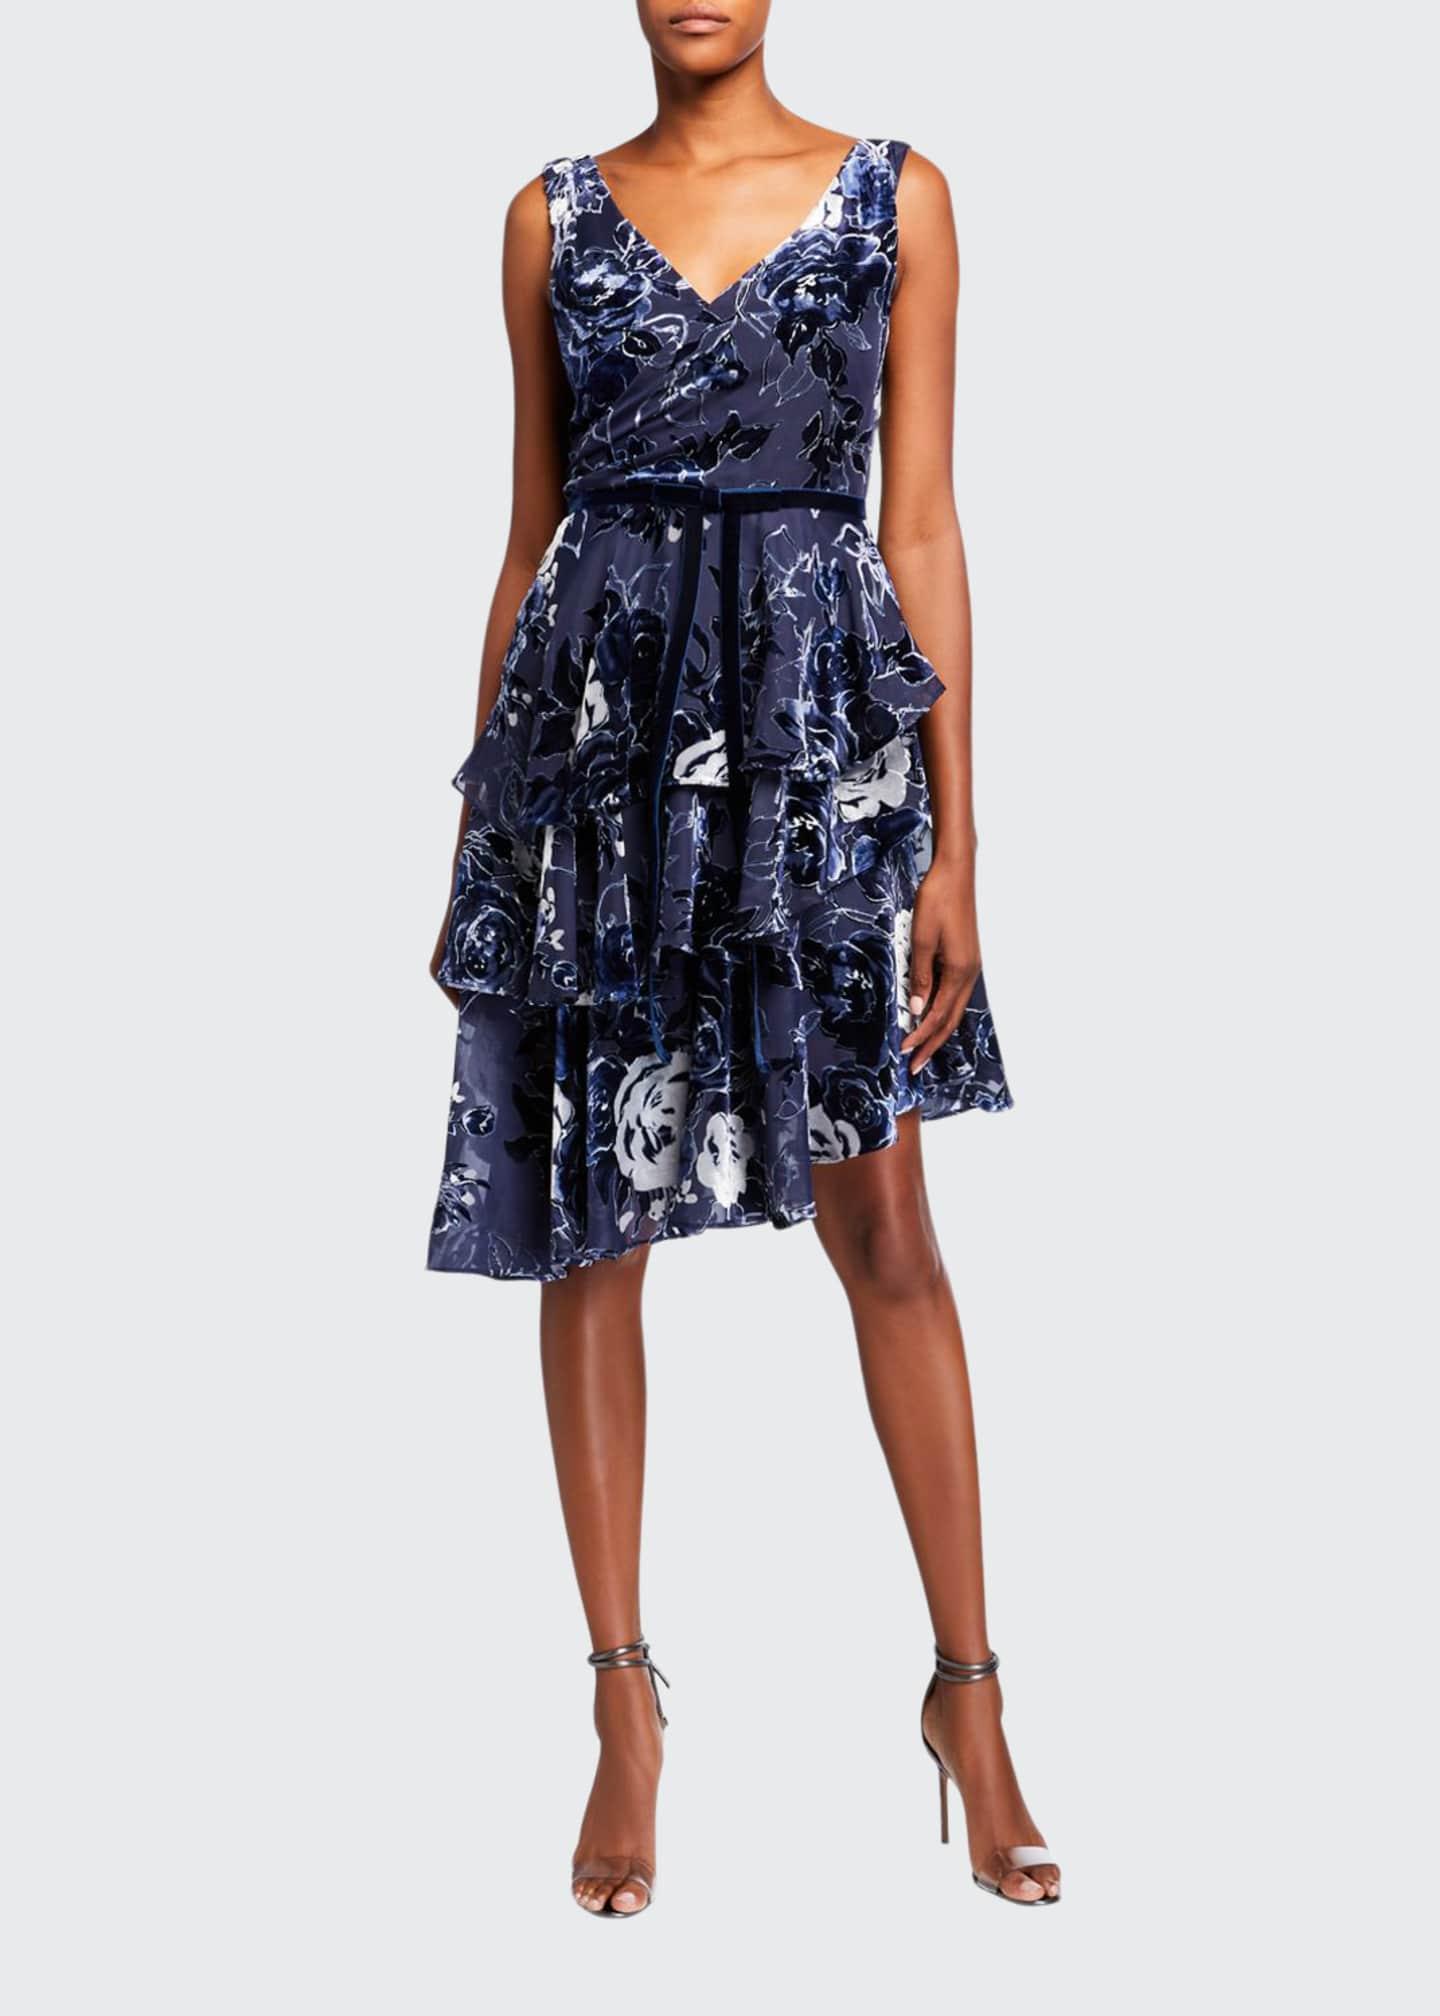 Marchesa Notte Sleeveless Velvet Burnout Chiffon Dress w/